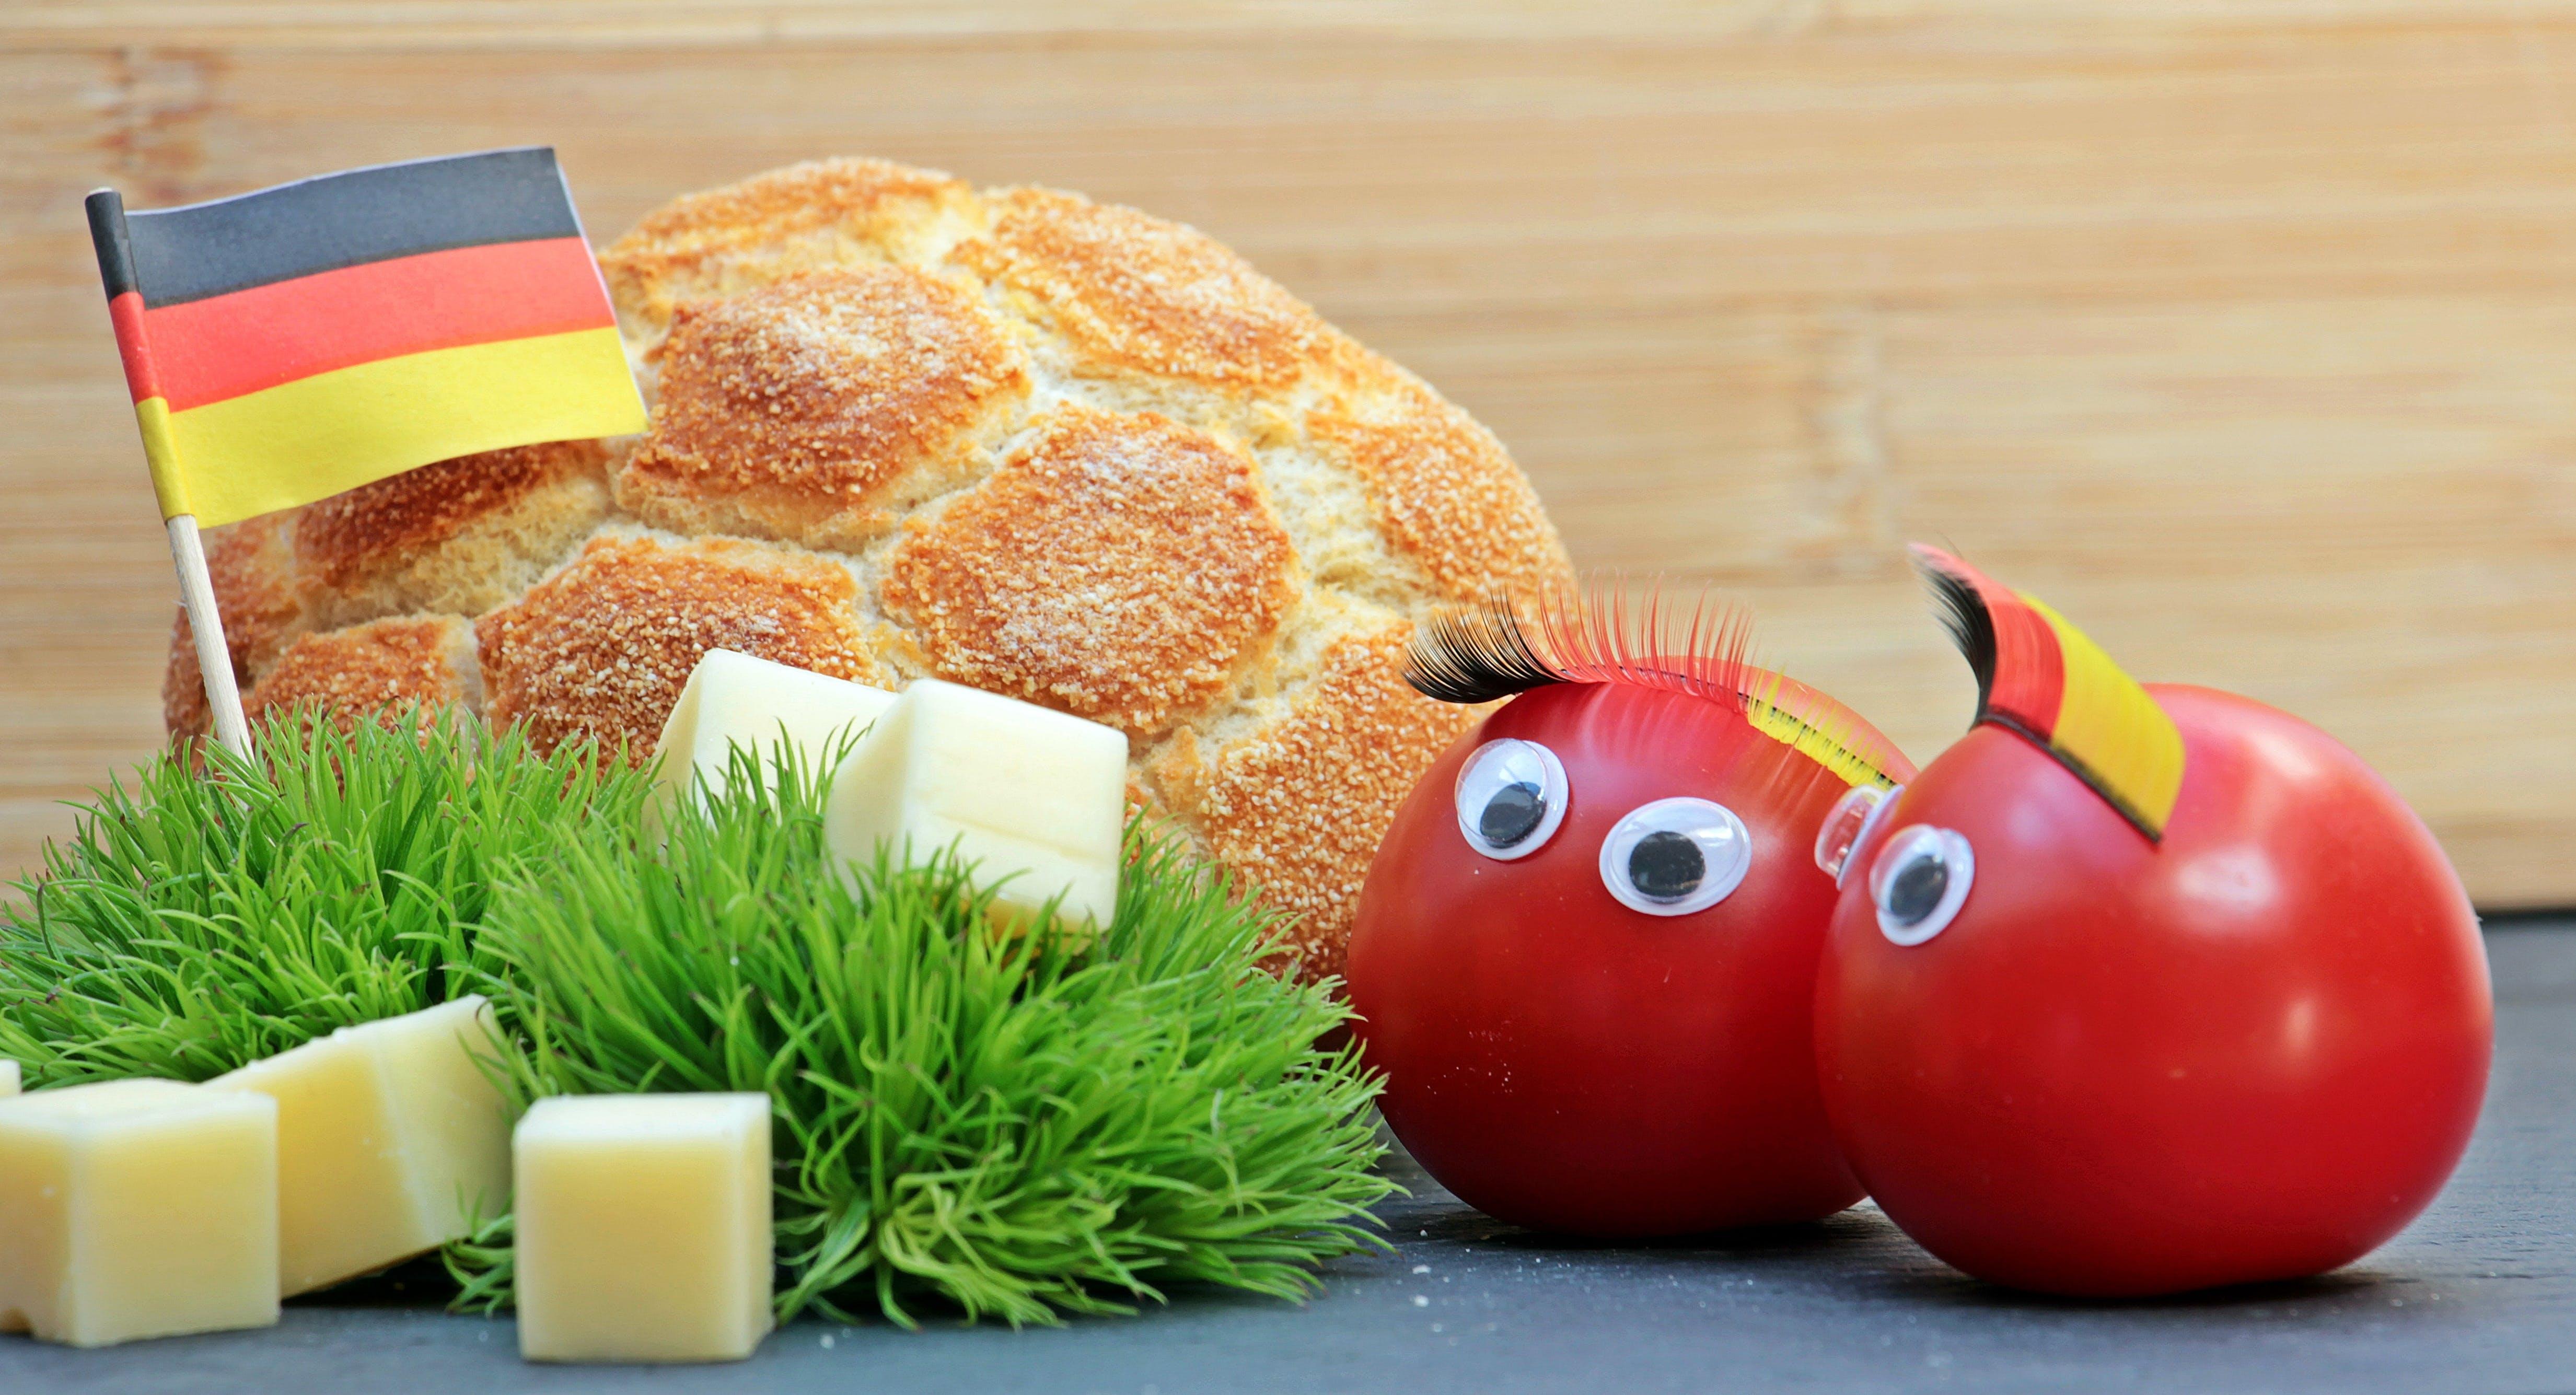 art, artistic, bread